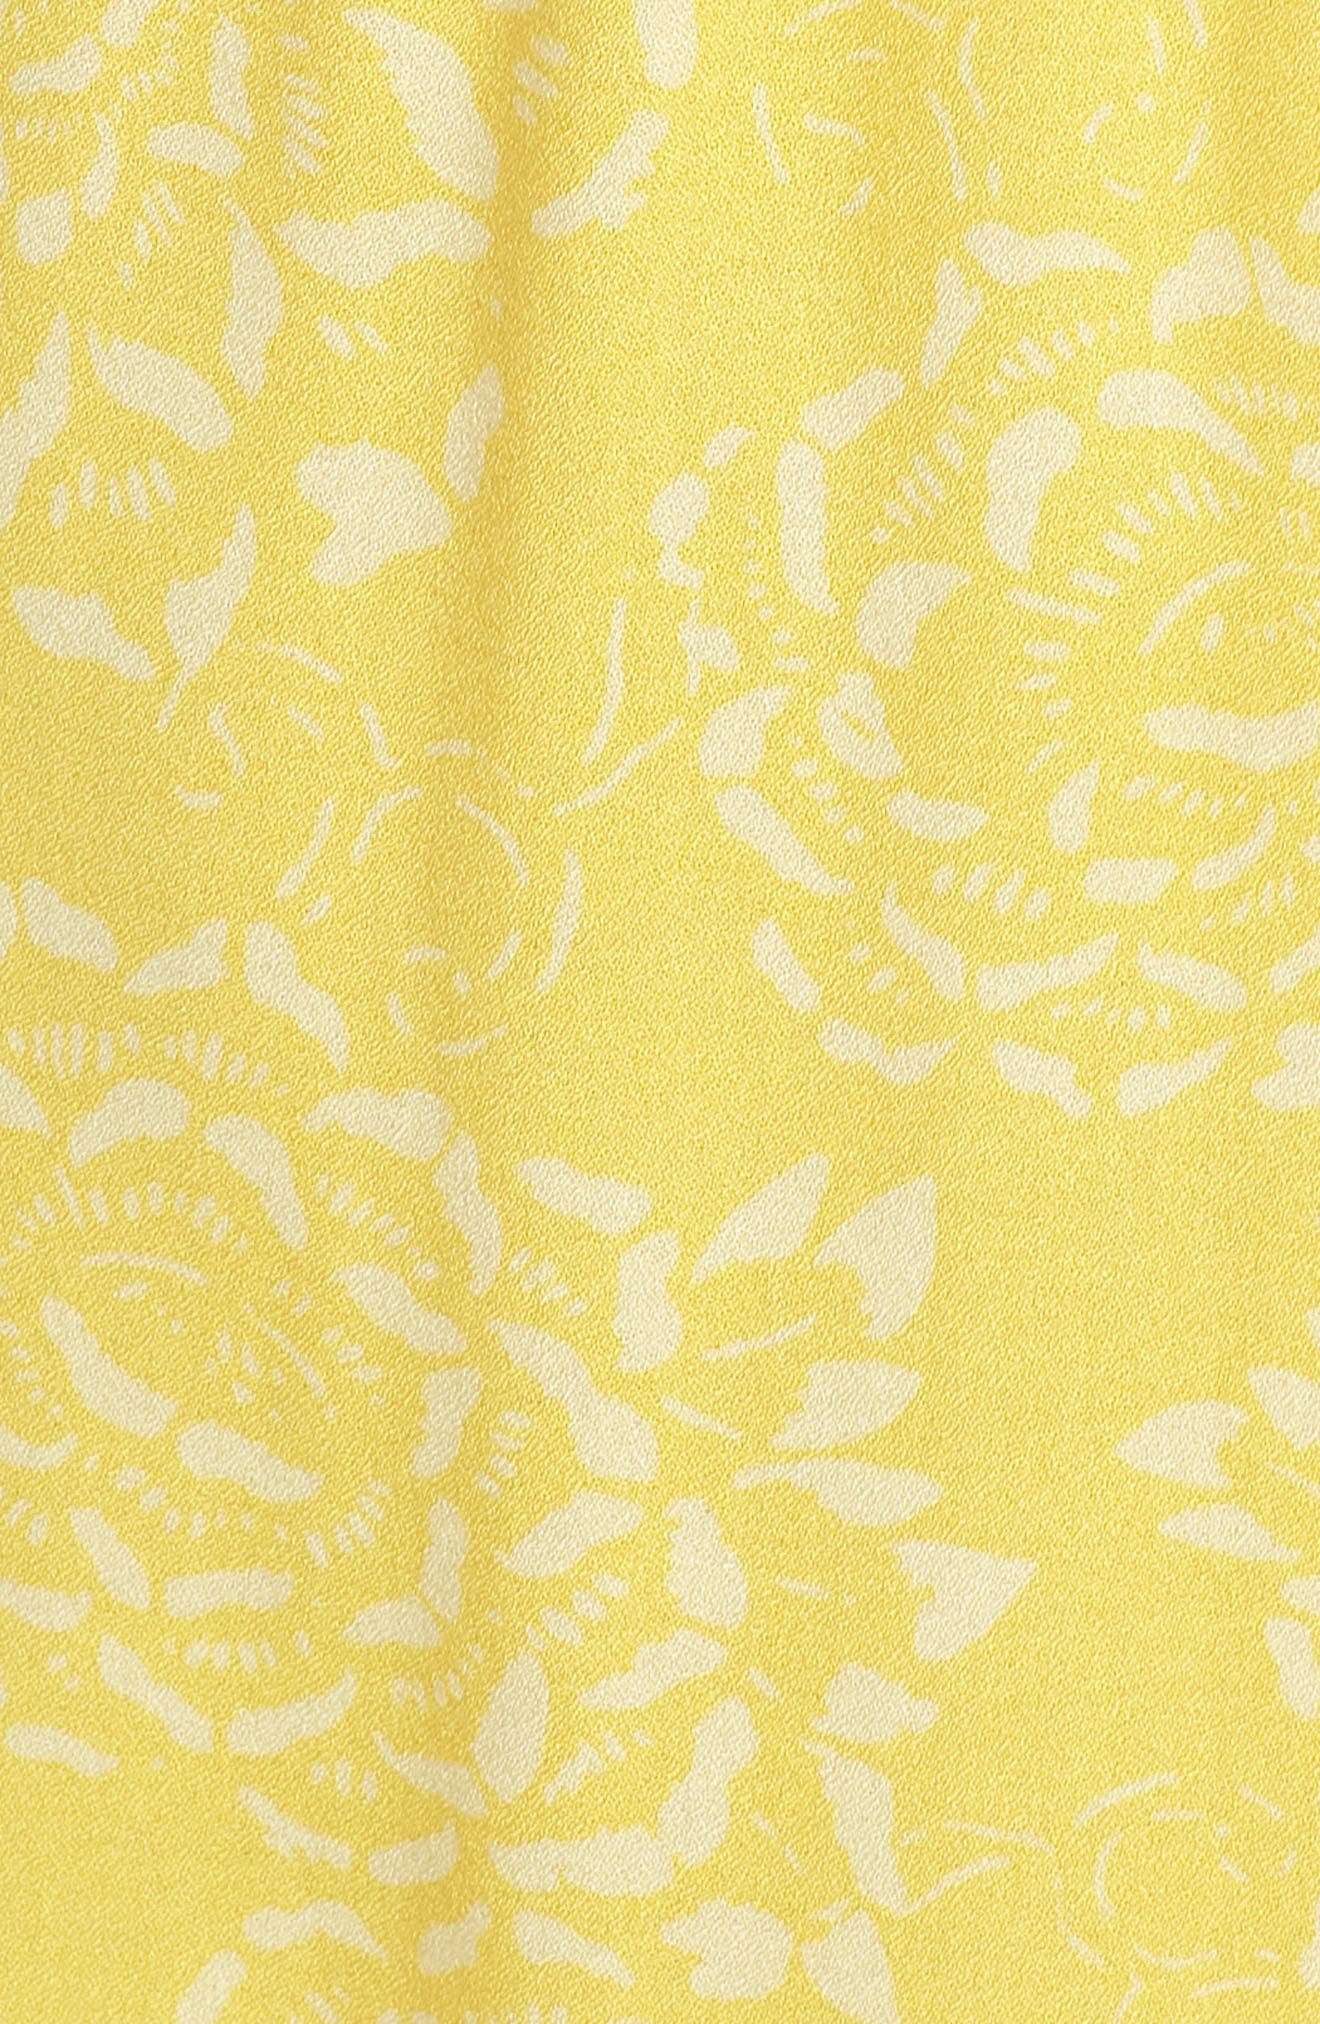 Lido Front Button Sheath Dress,                             Alternate thumbnail 6, color,                             707